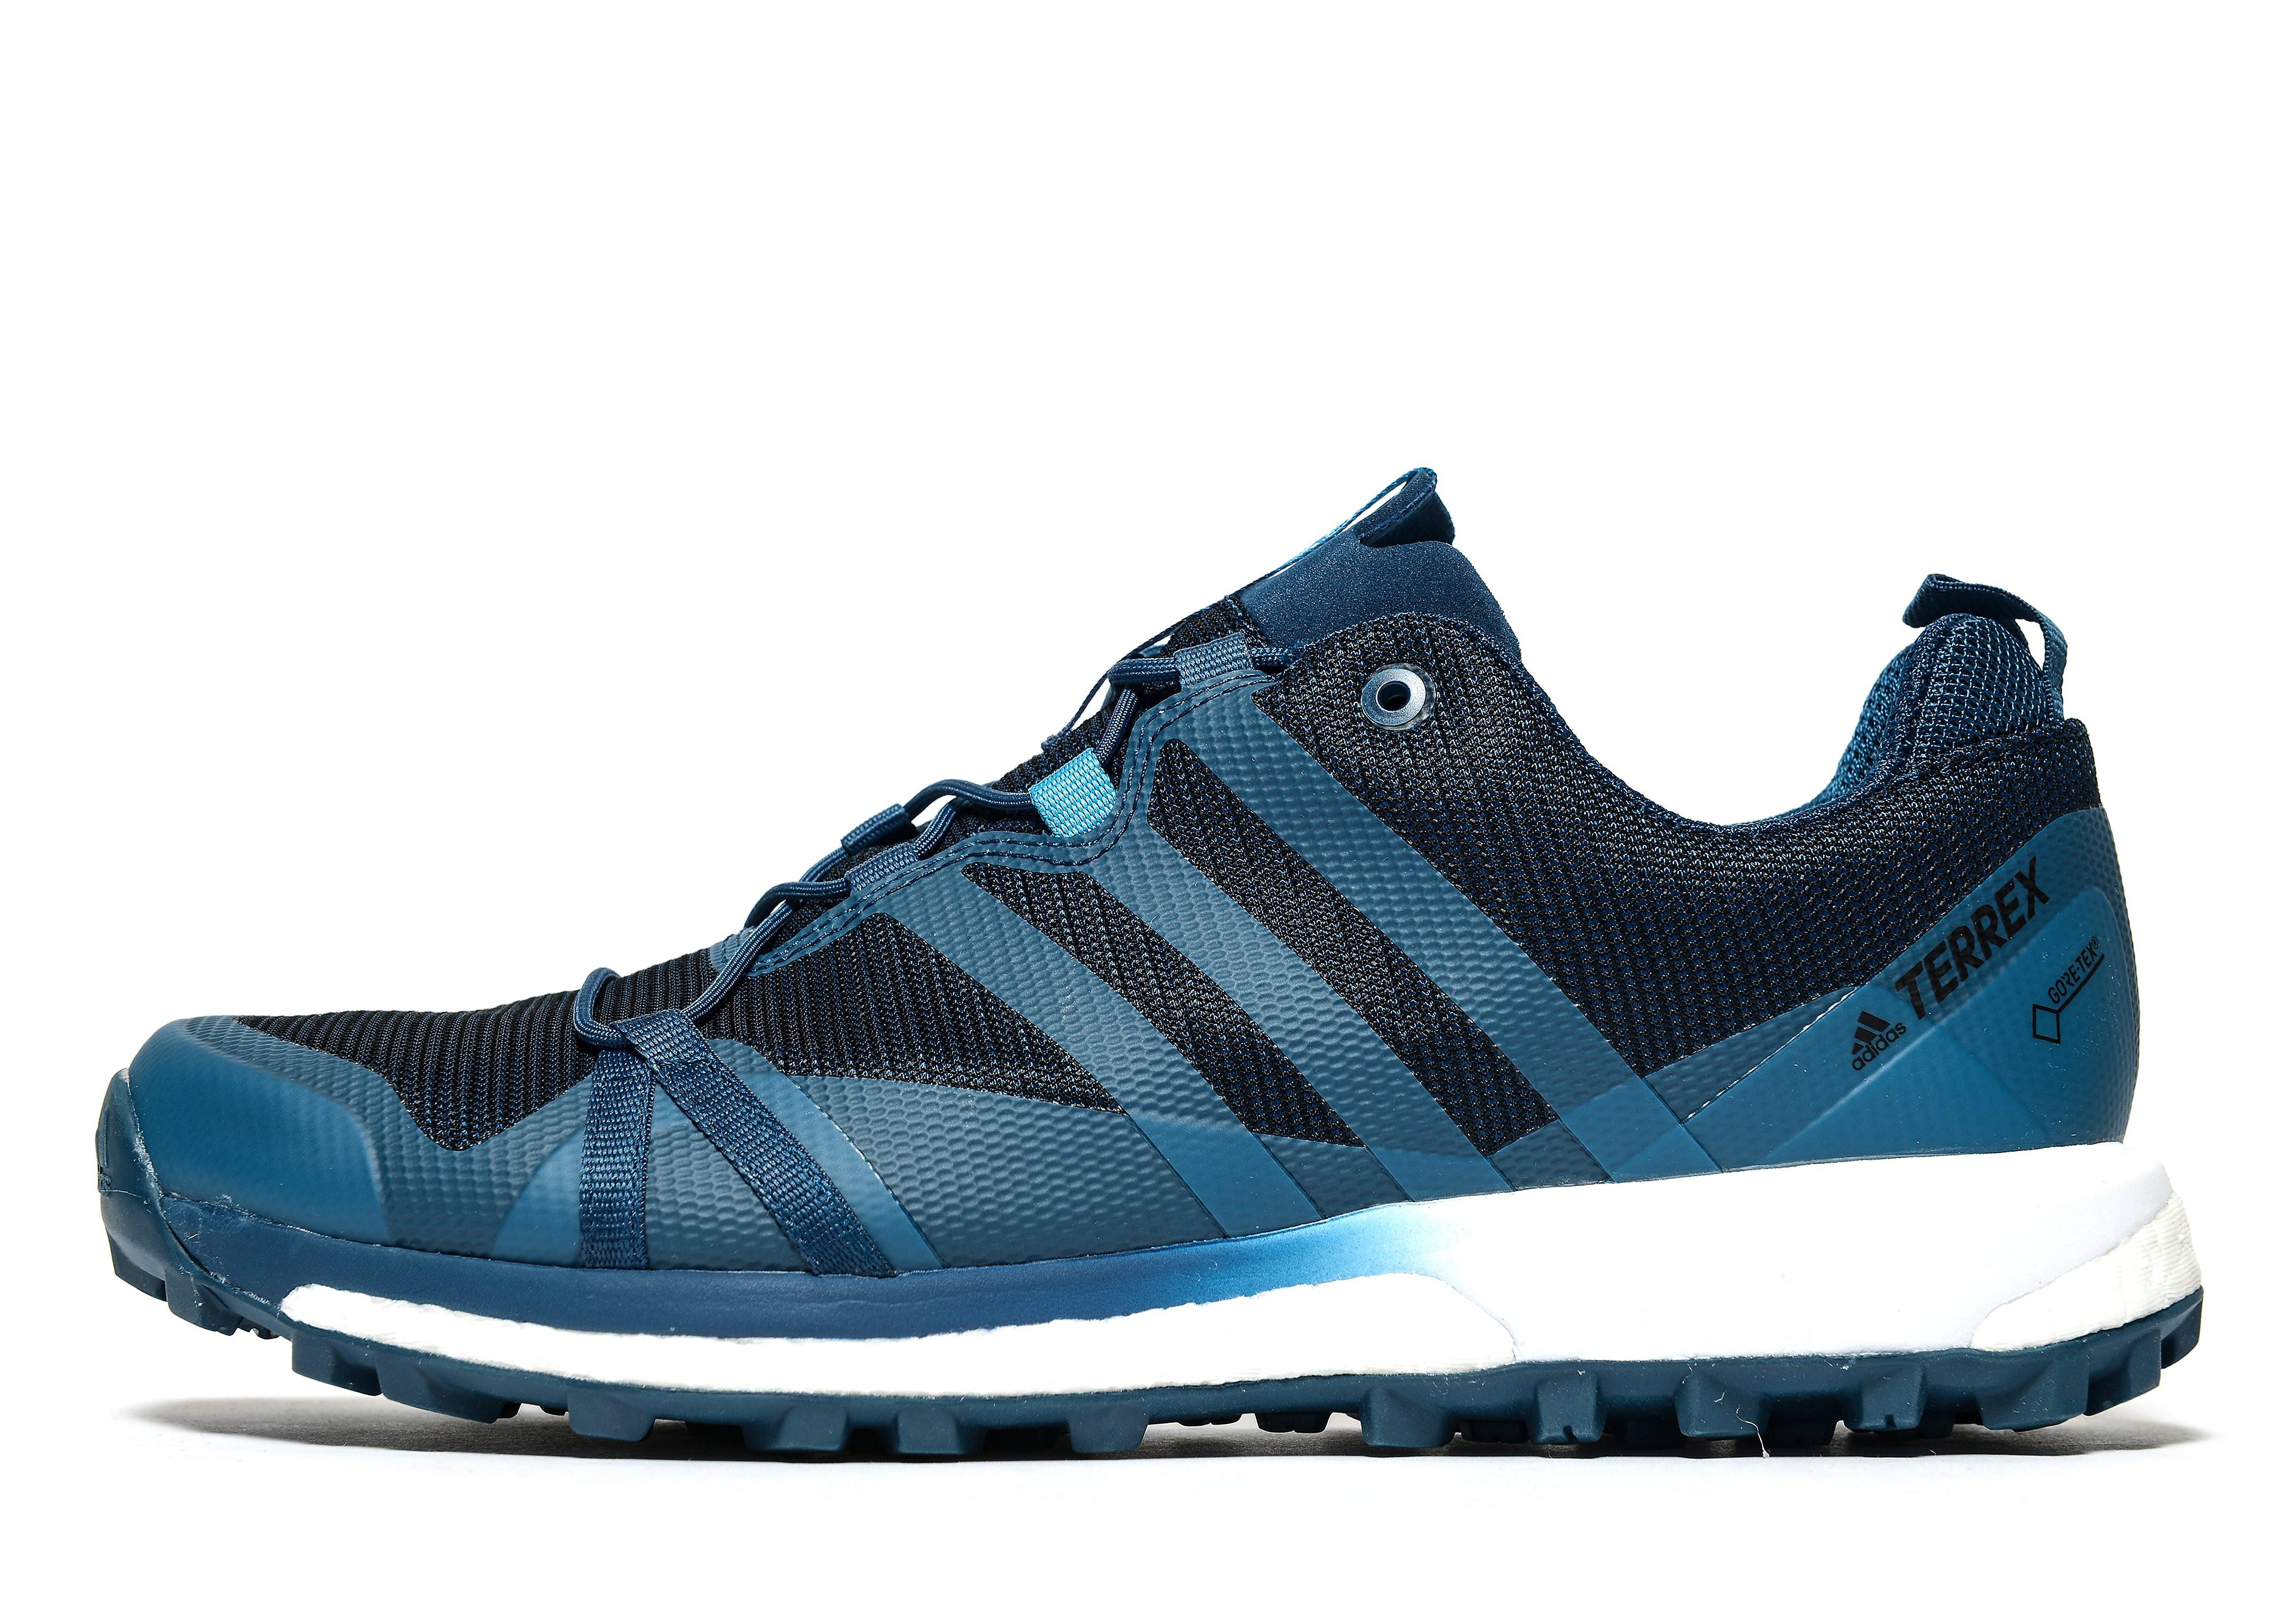 adidas Terrex Agravic GTX Trail Running Shoes